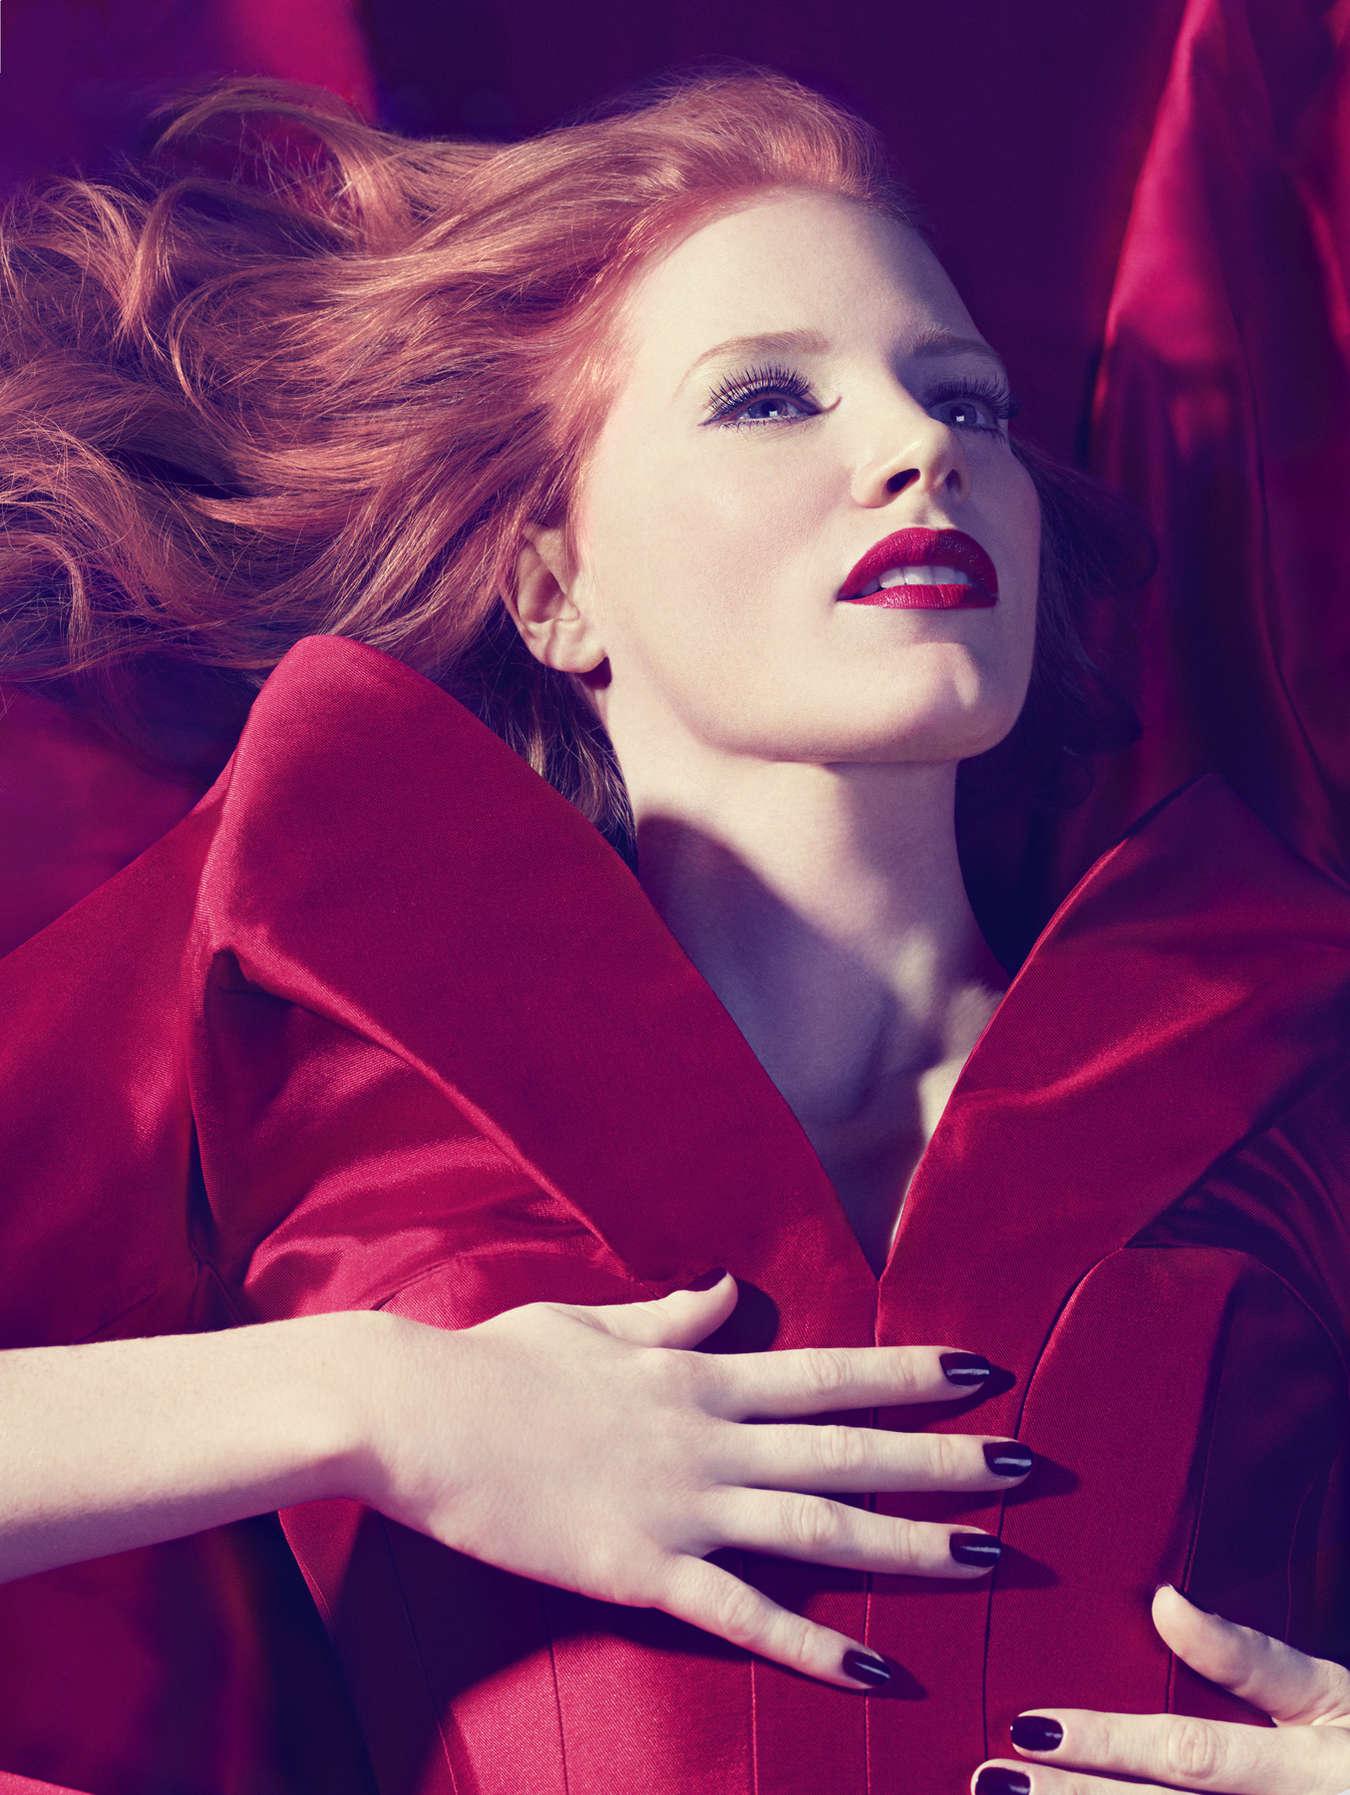 Jessica Chastain In Style Magazine Photoshoot 2013 05 Gotceleb